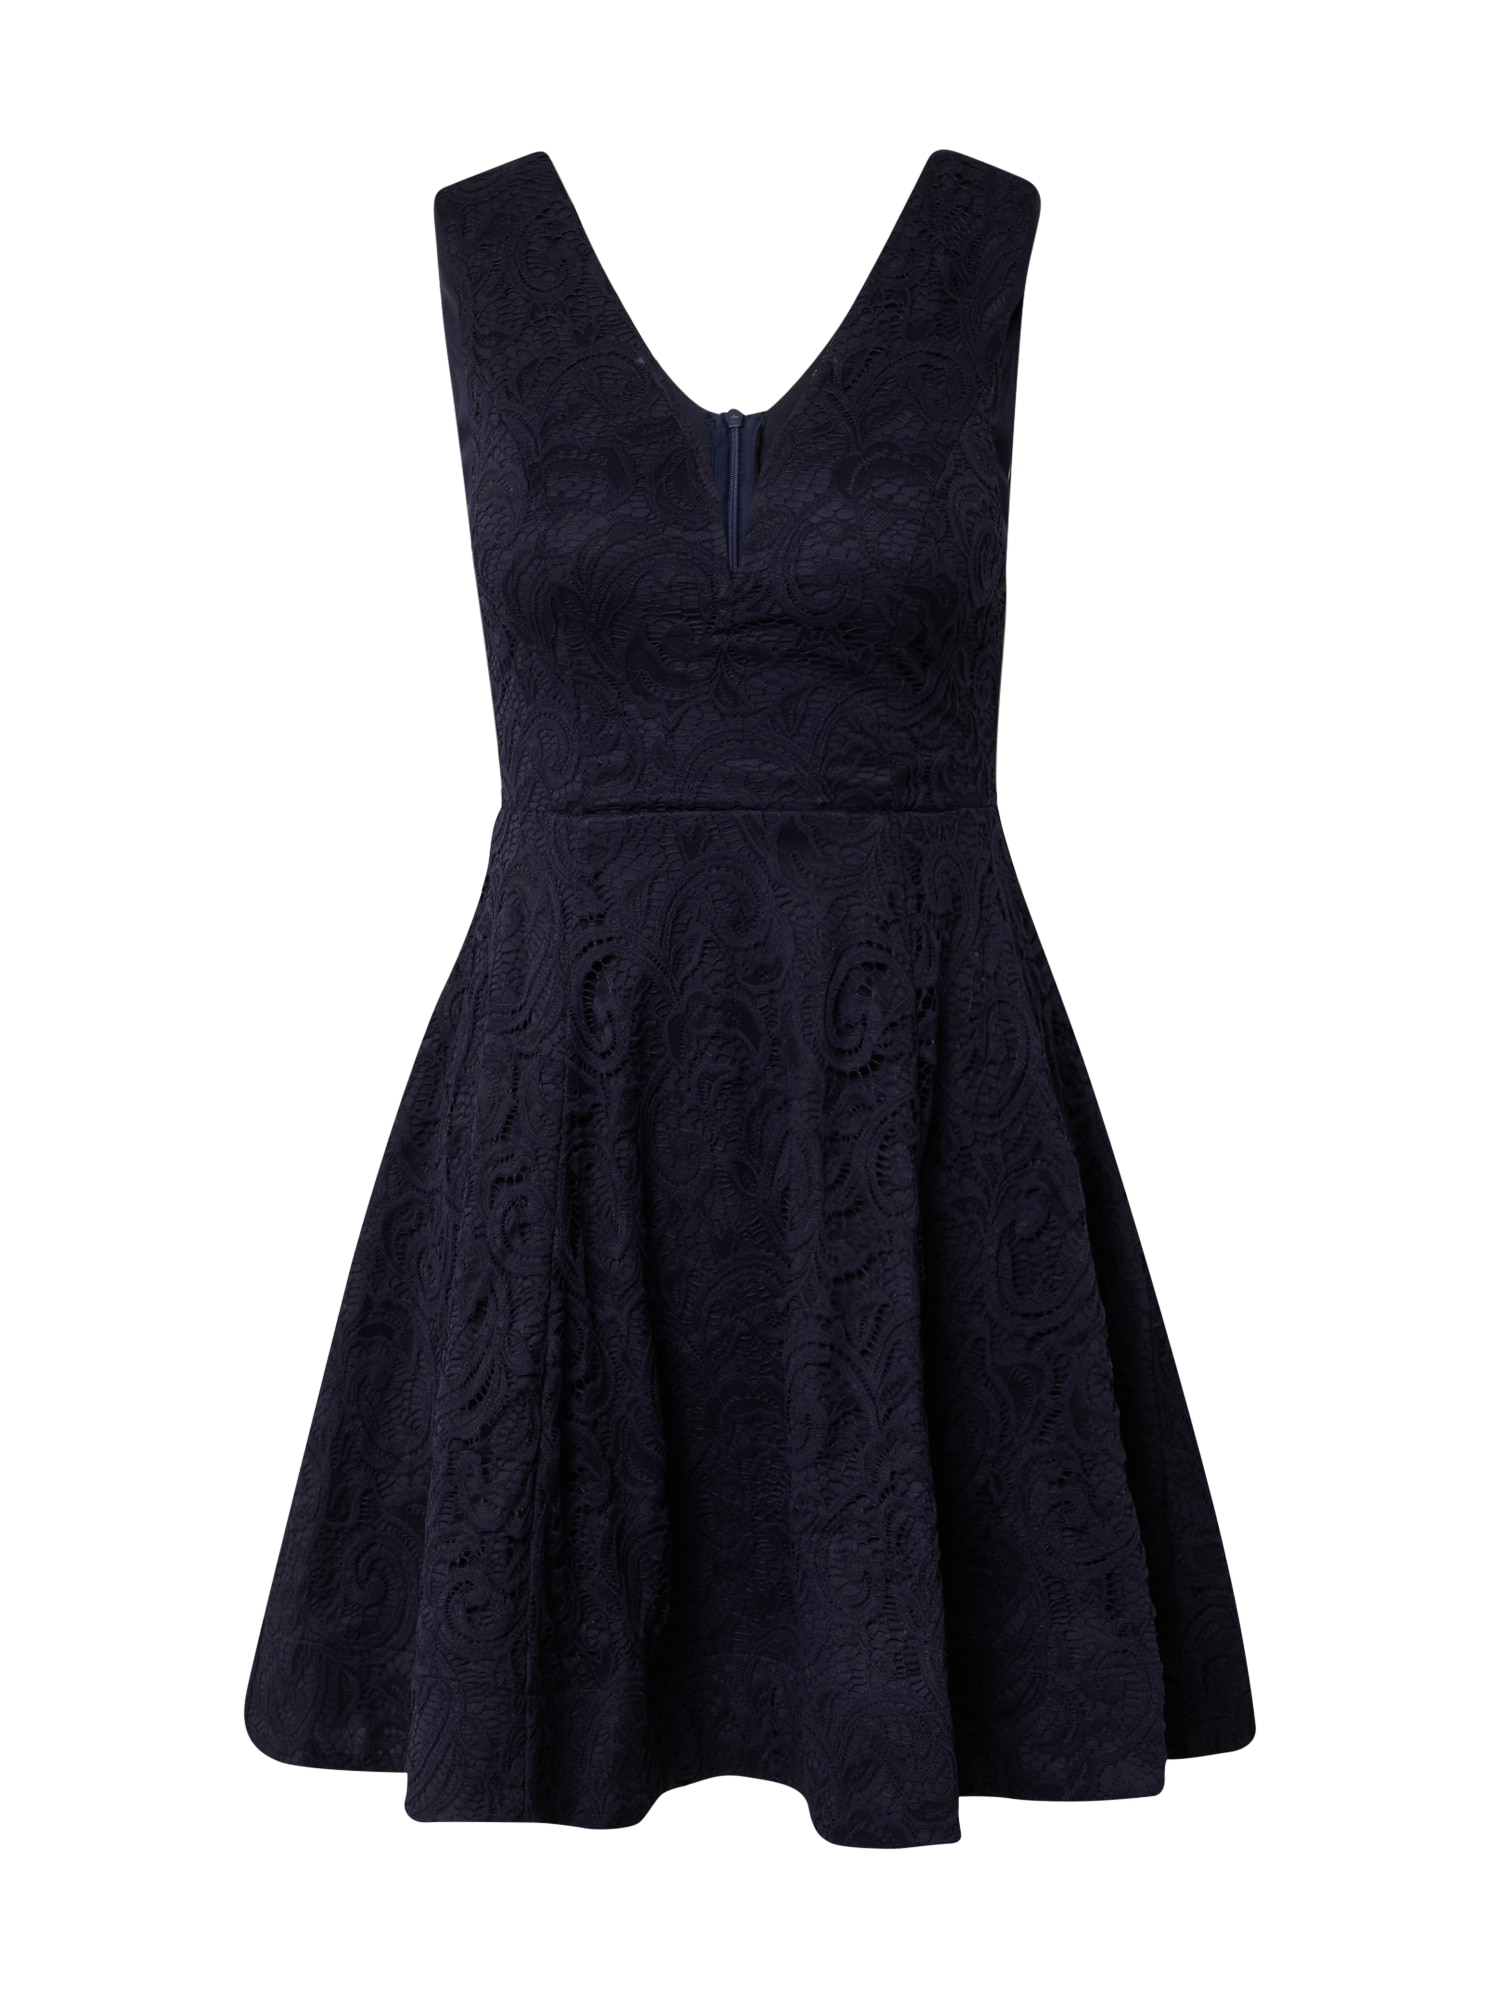 Skirt & Stiletto Suknelė tamsiai mėlyna